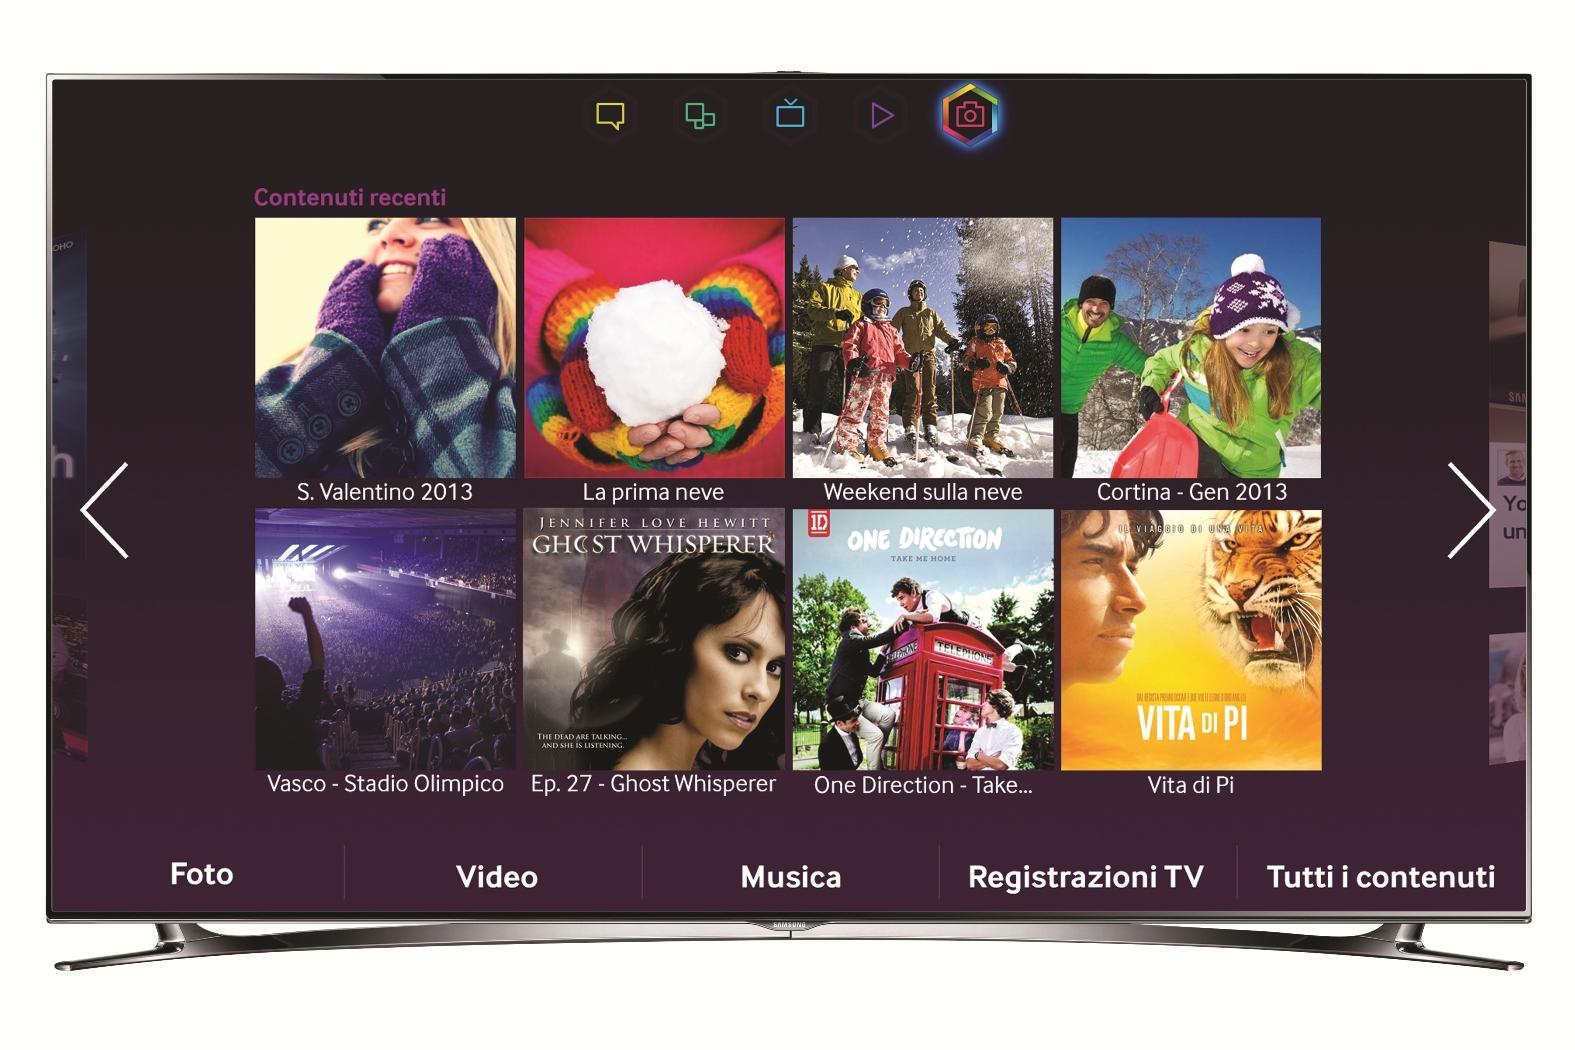 SMART TV F8000_SMART HUB_Foto, Video e Musica